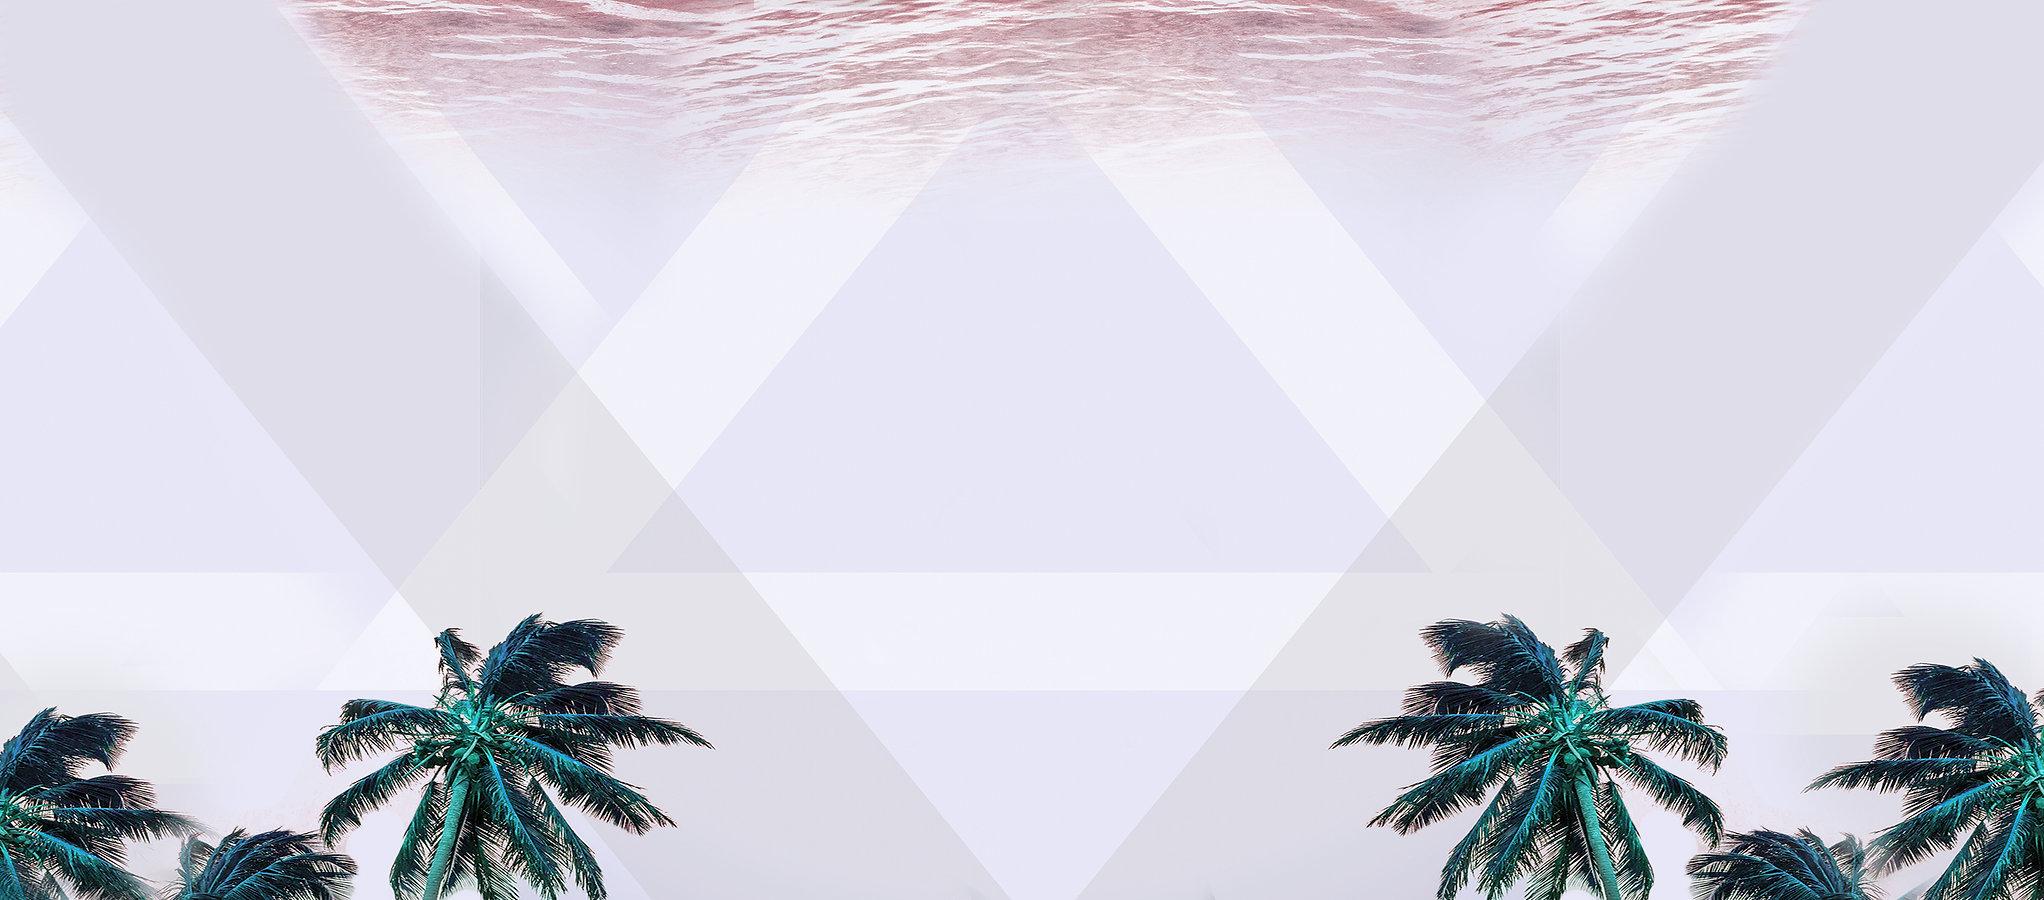 orlando21 background.jpg